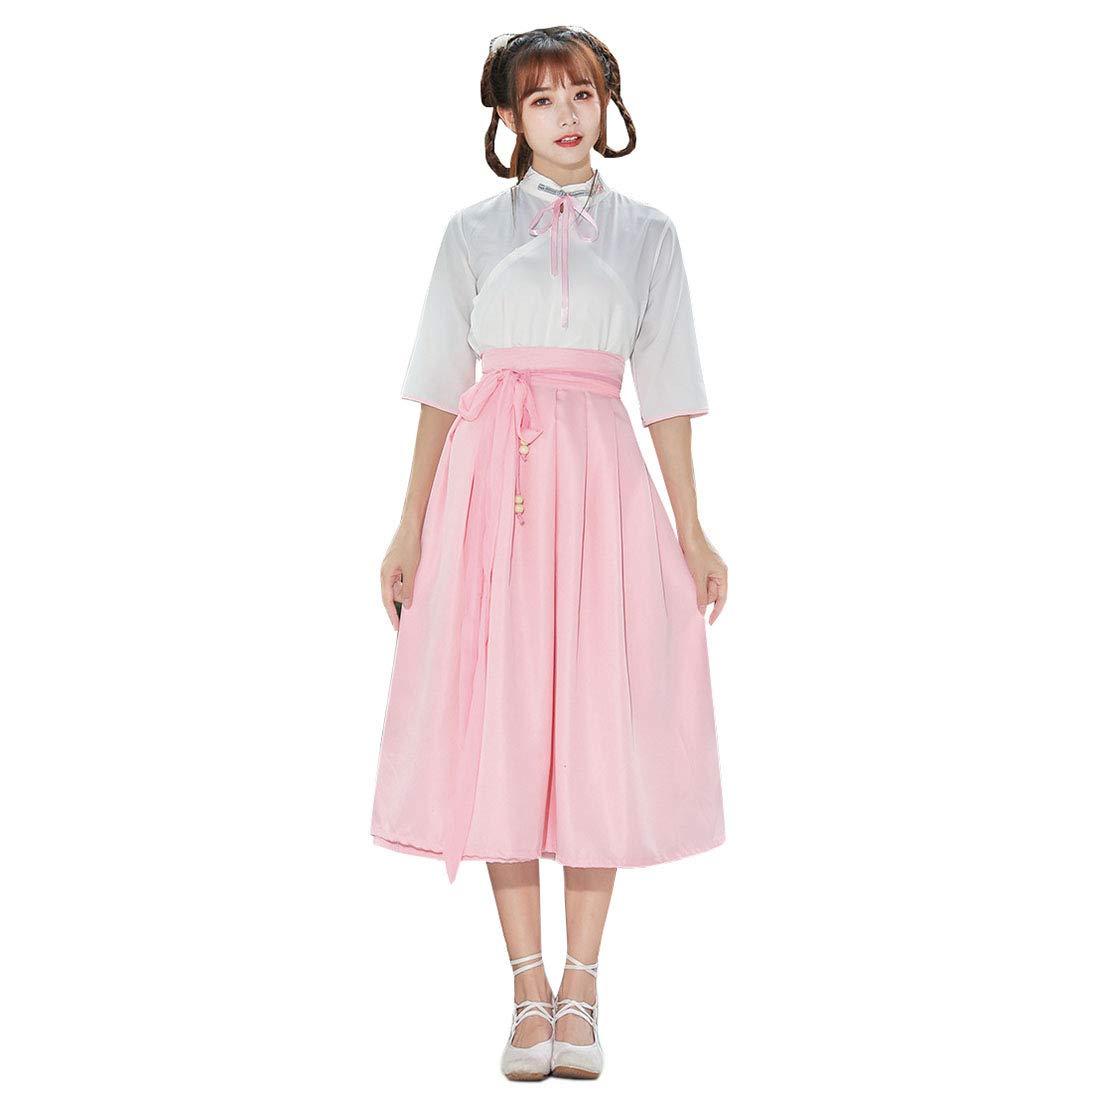 Ez-sofei Womens Ancient Chinese Traditional Costume Hanfu Dress Short Sleeve